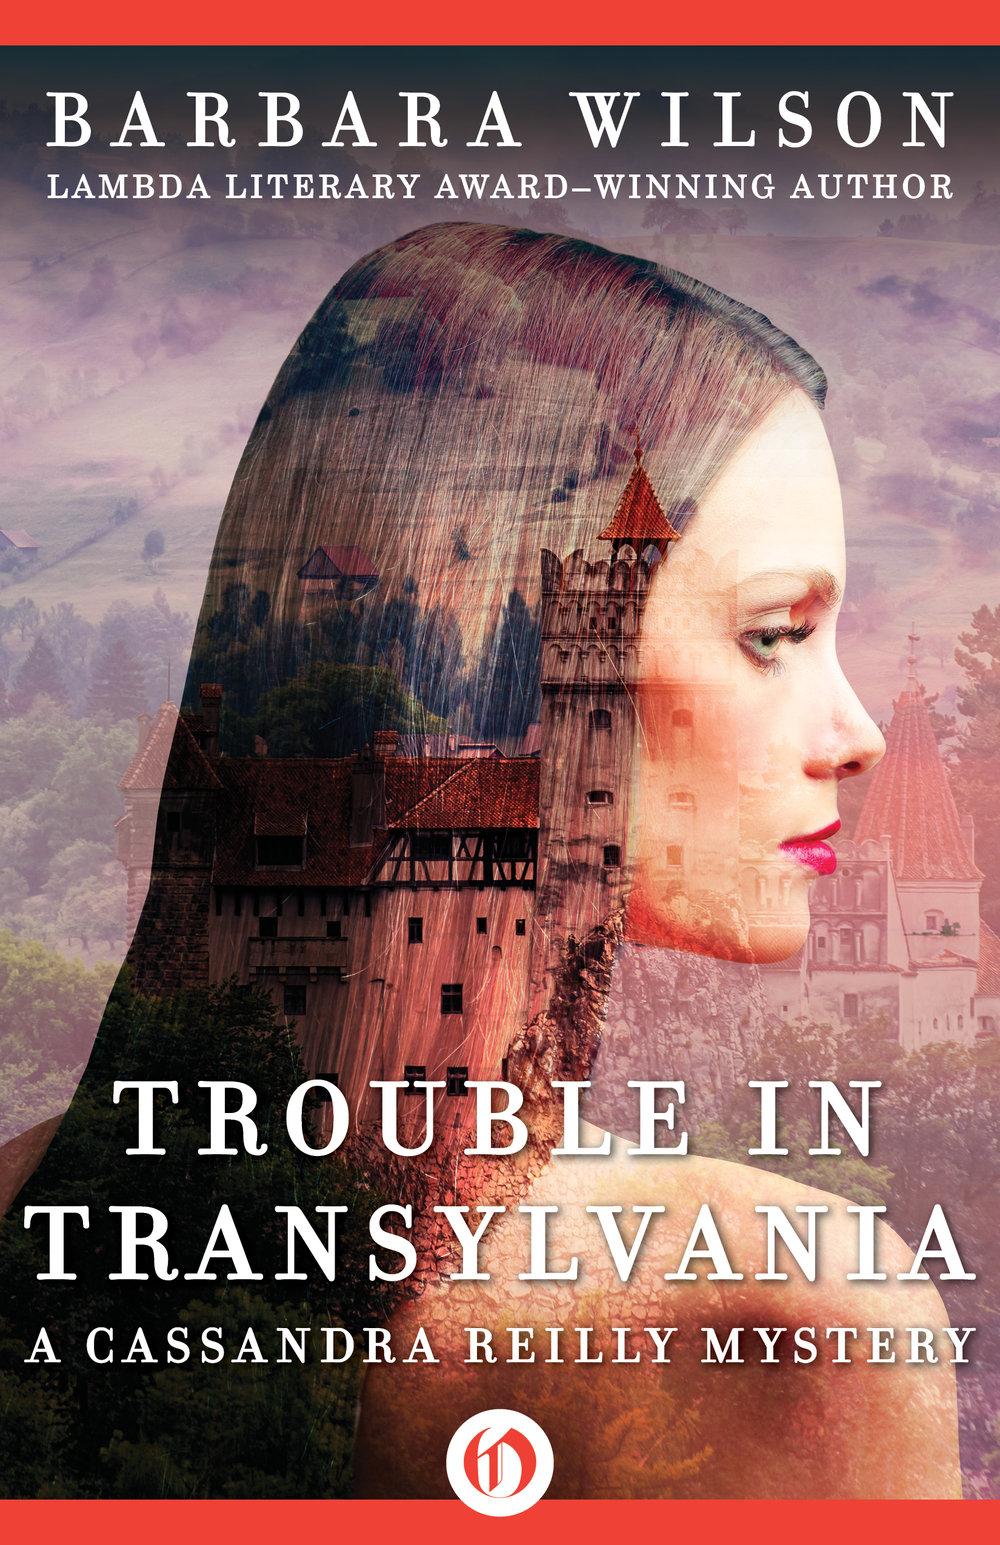 Cassandra travels through Central Europe -